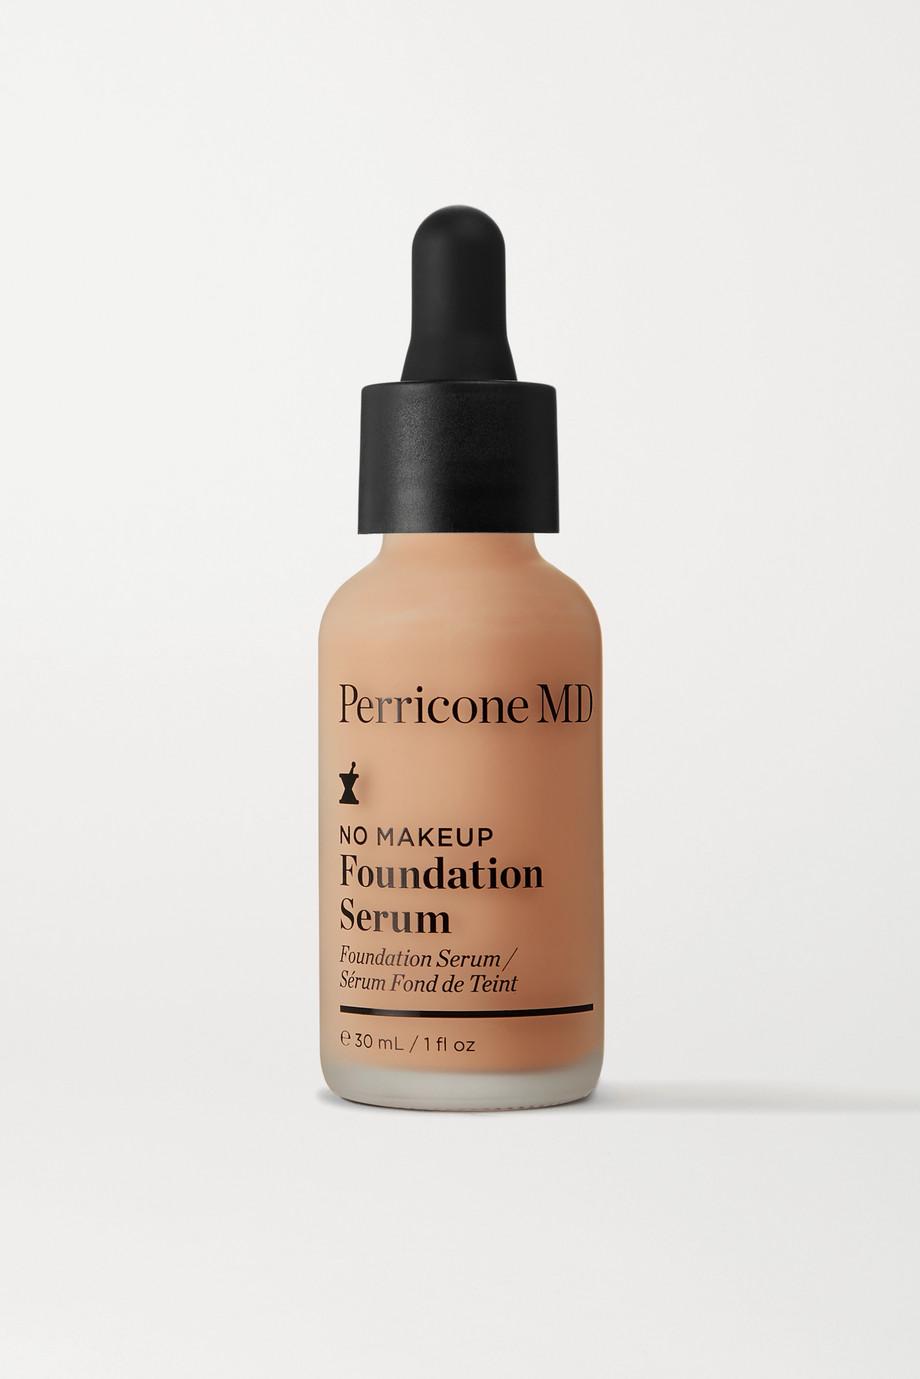 Perricone MD Fond de teint sérum No Makeup à large spectre SPF 20, Buff, 30 ml